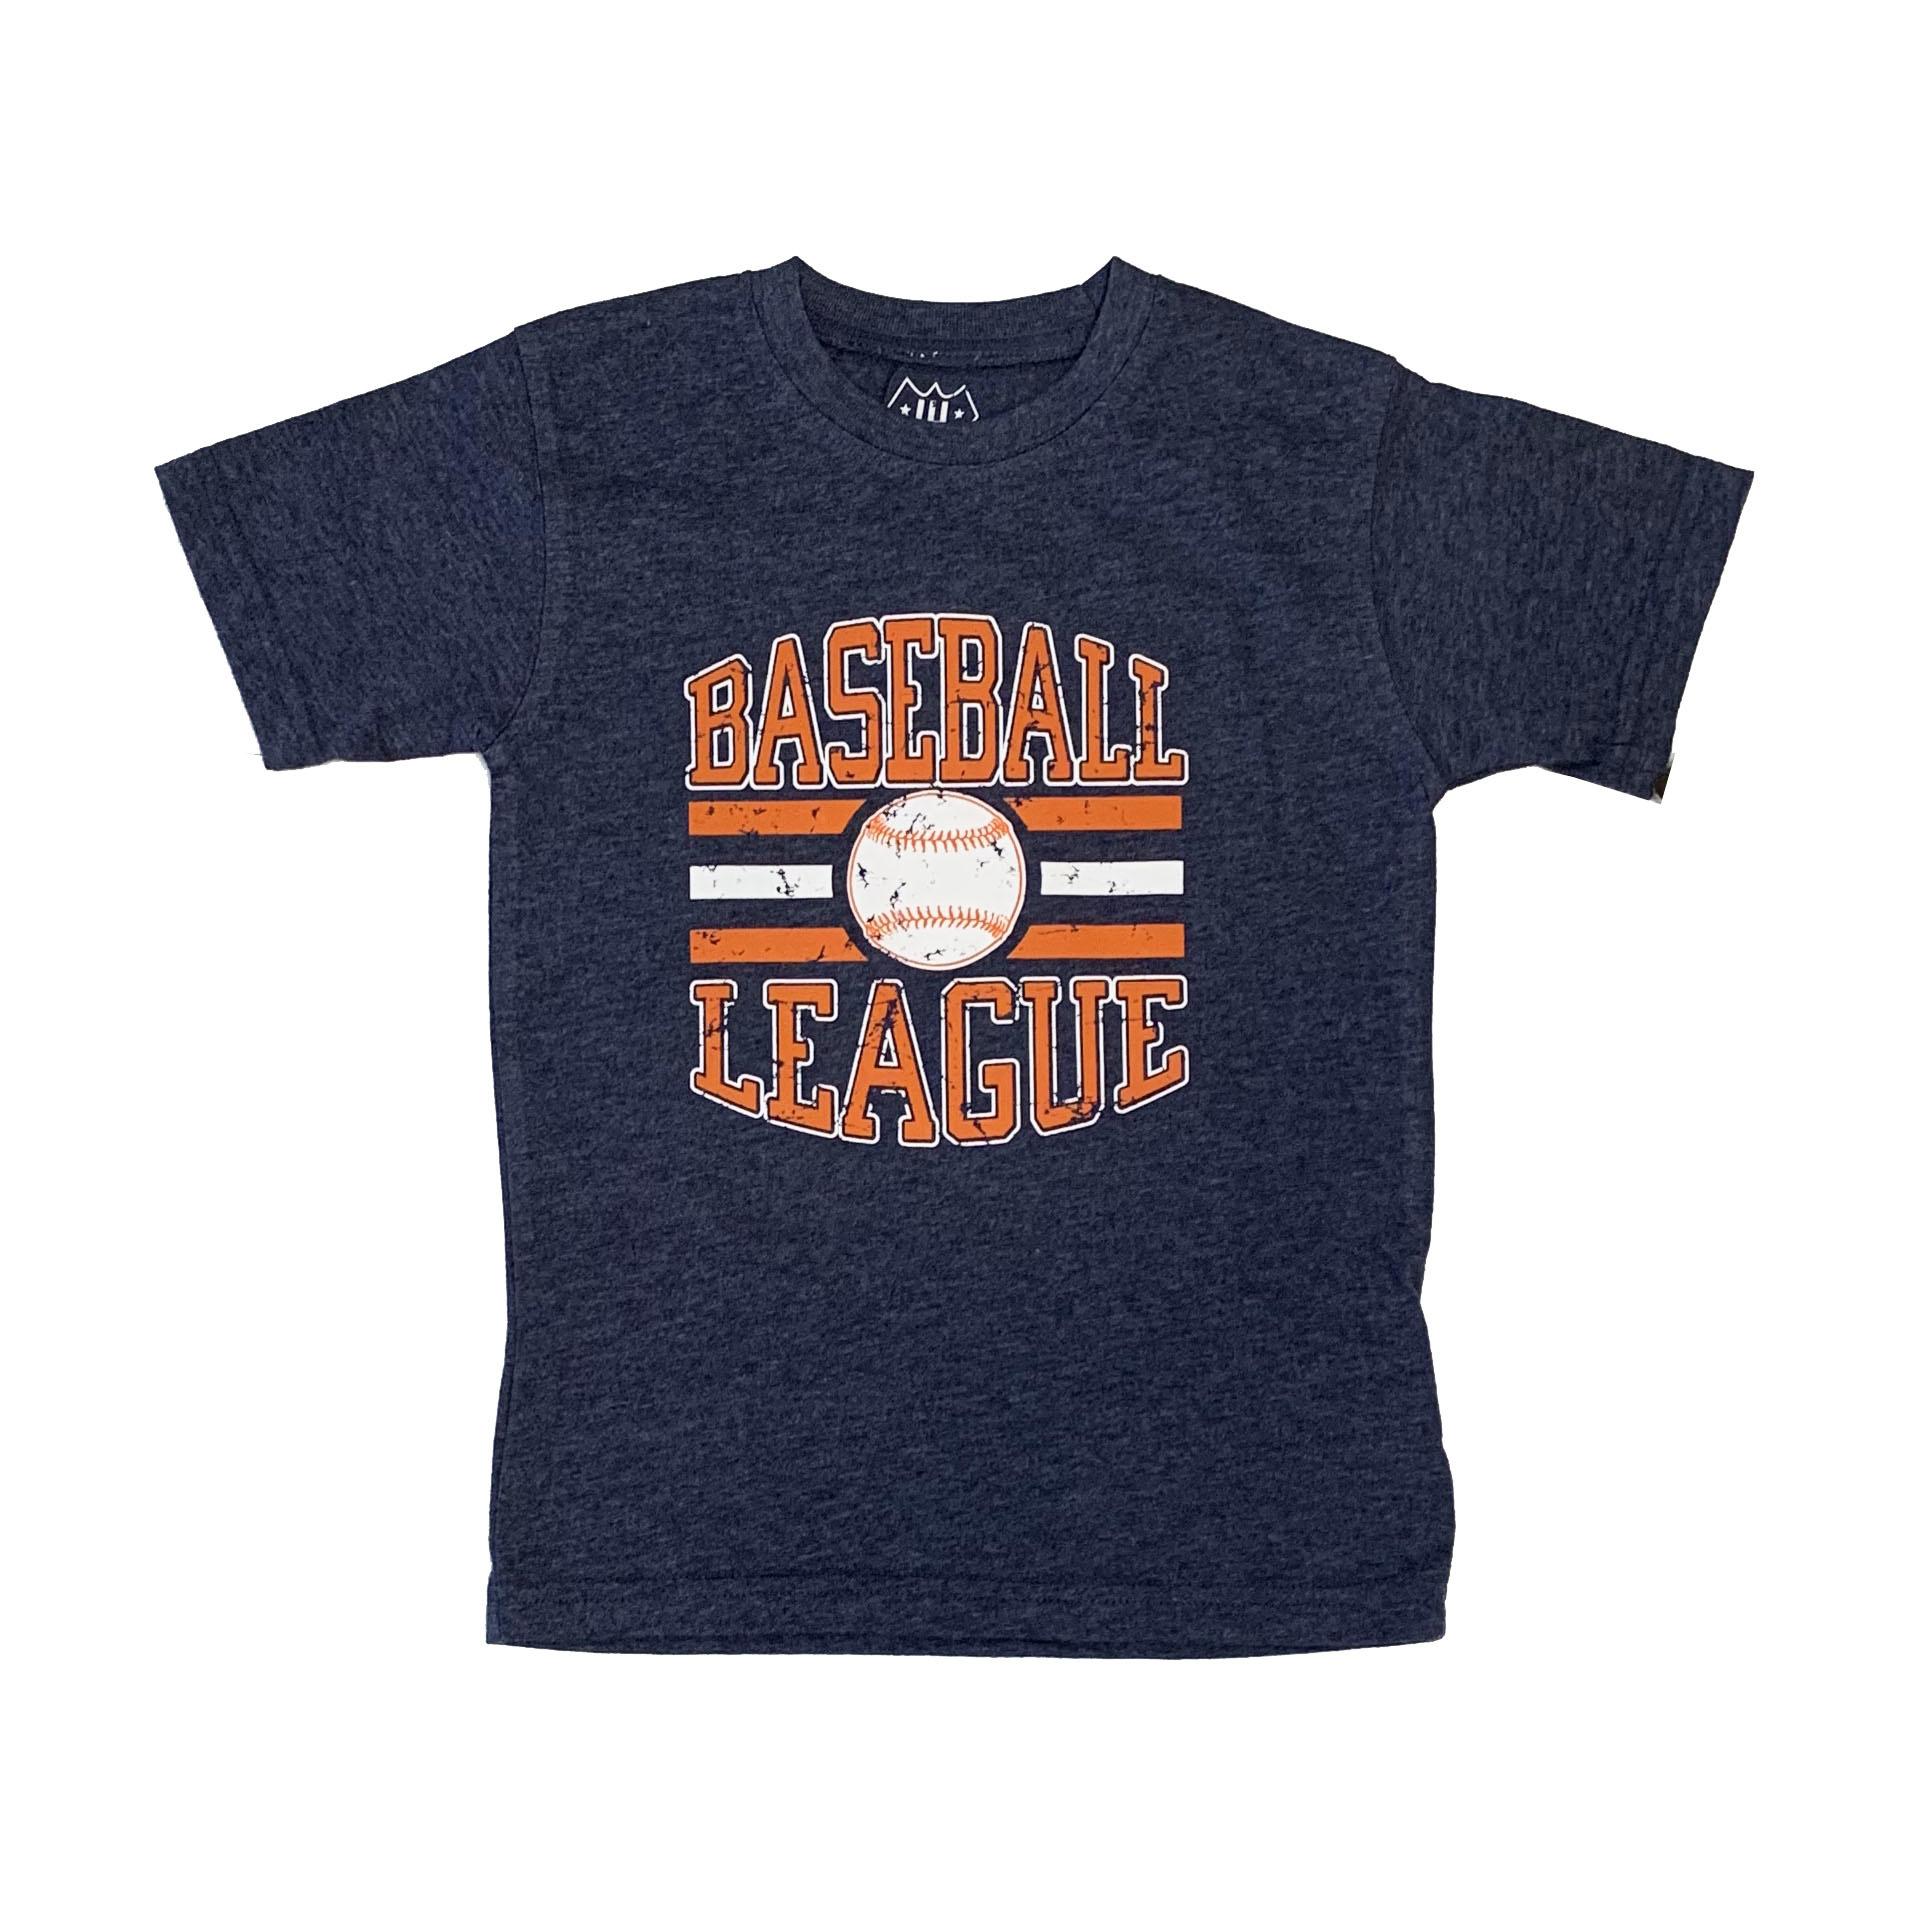 Wes & Willy Navy & Orange Baseball League Tee